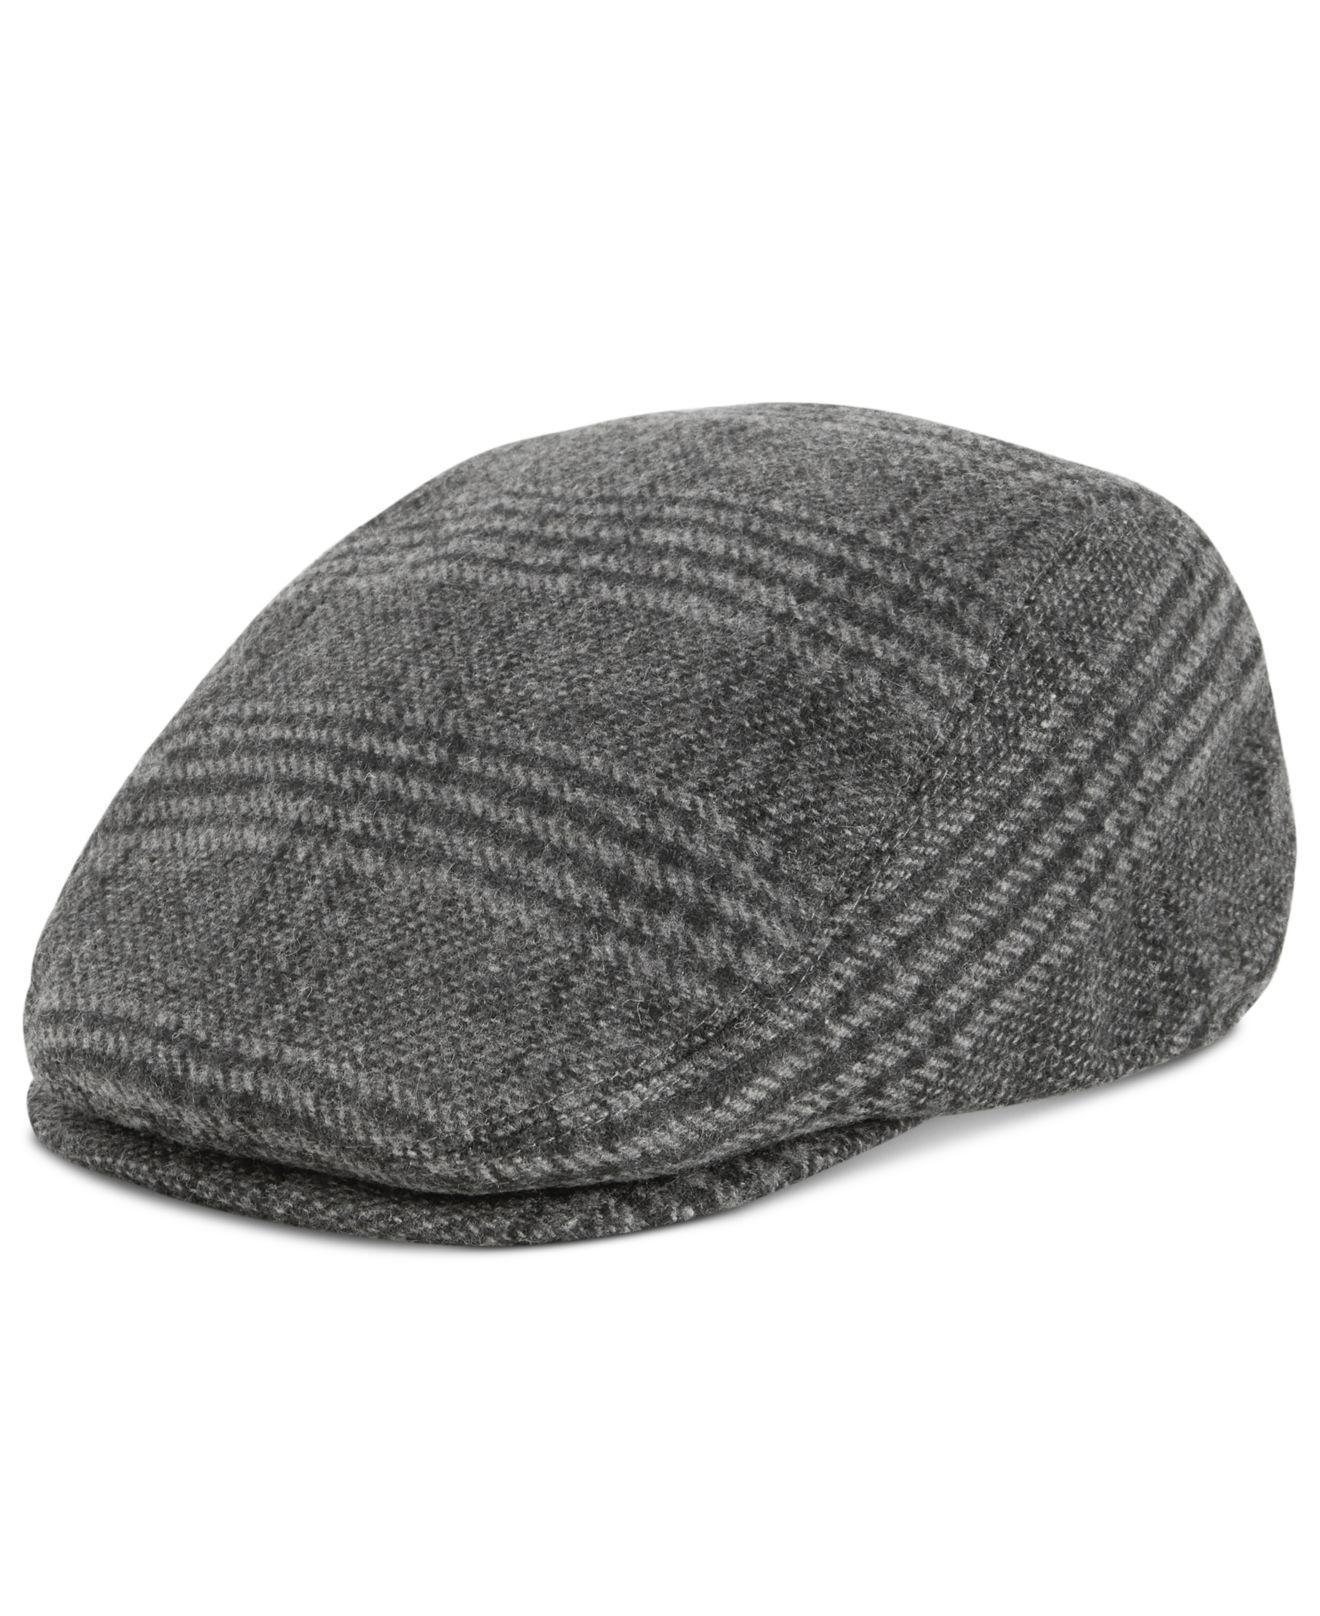 Lyst - Levi s Men s Plaid Flat Top Plaid Ivy Hat in Gray for Men 955dea73c8b5